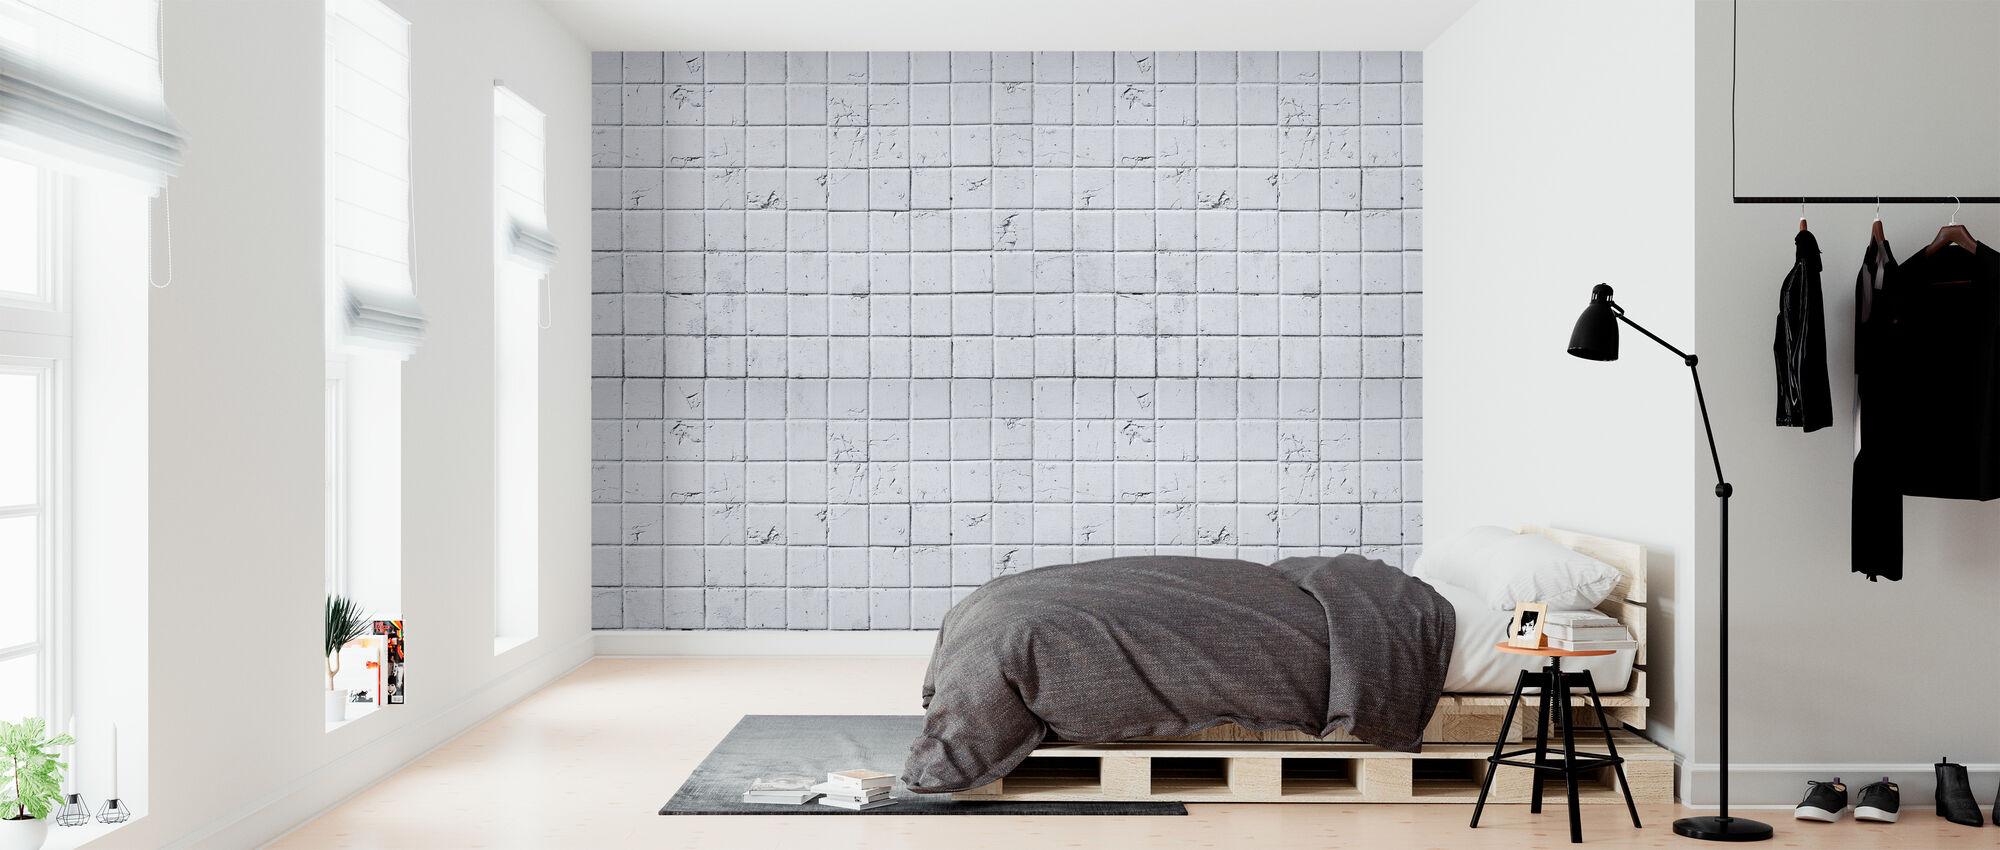 Oude witte tegel muur - 15x15 - Behang - Slaapkamer